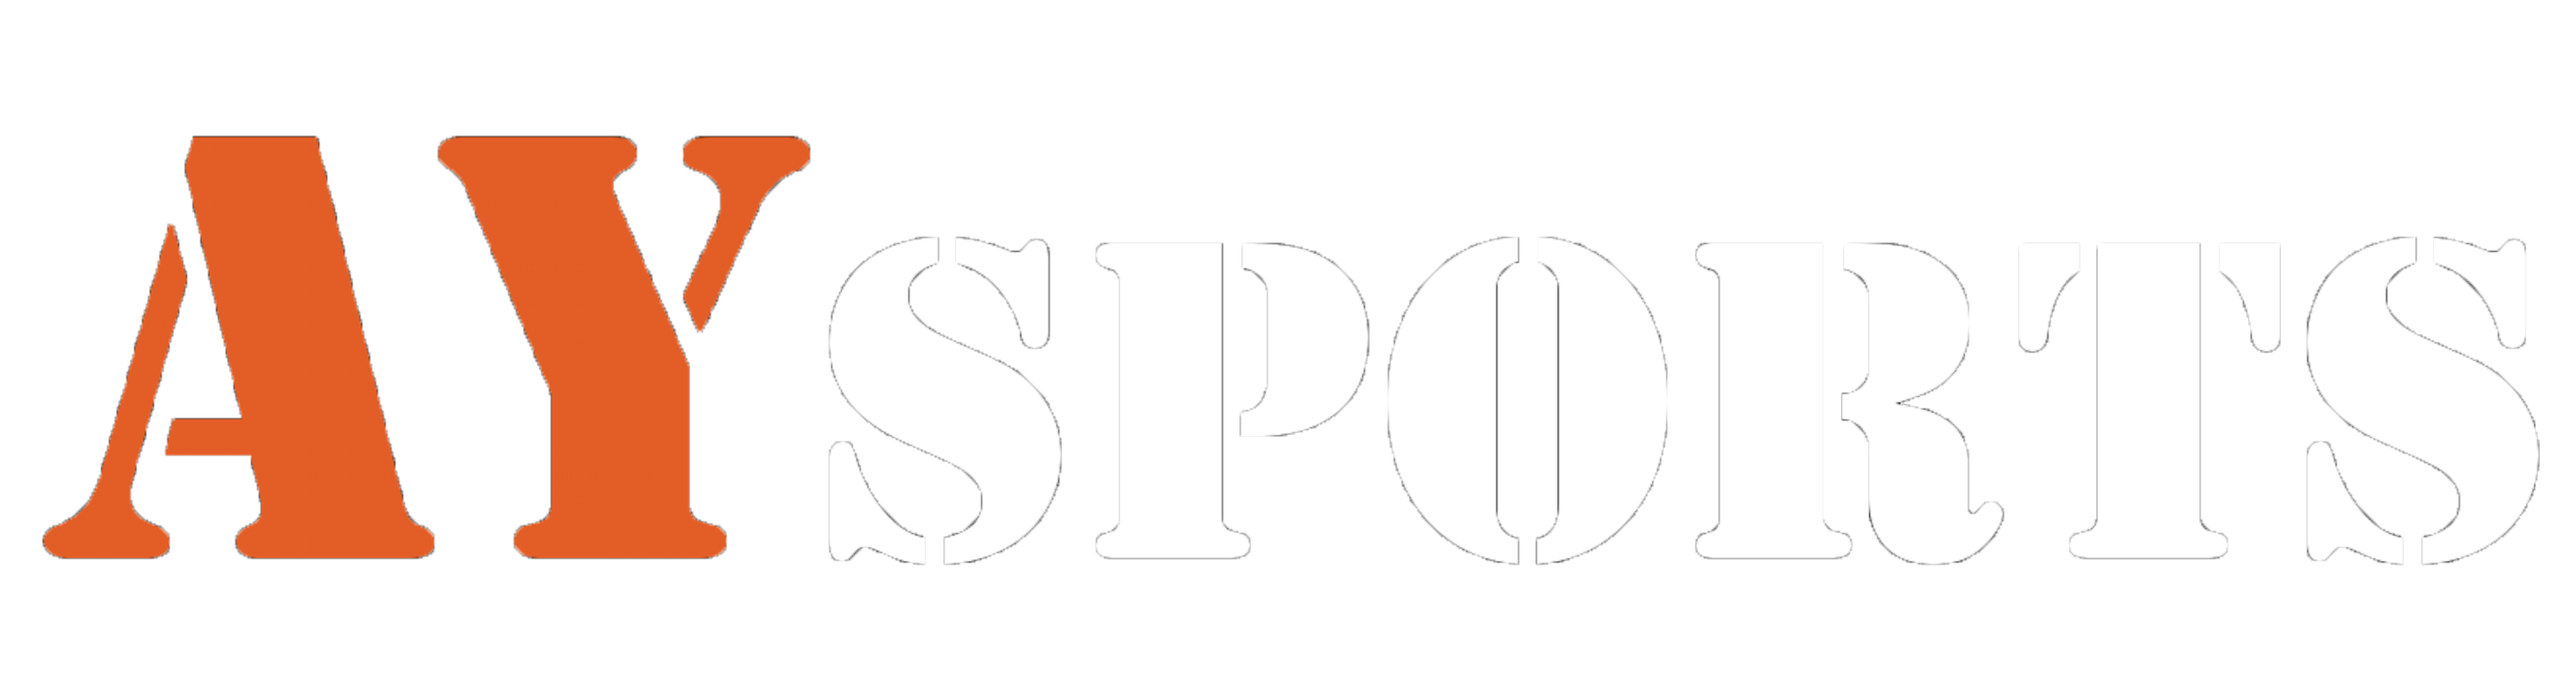 AYsports